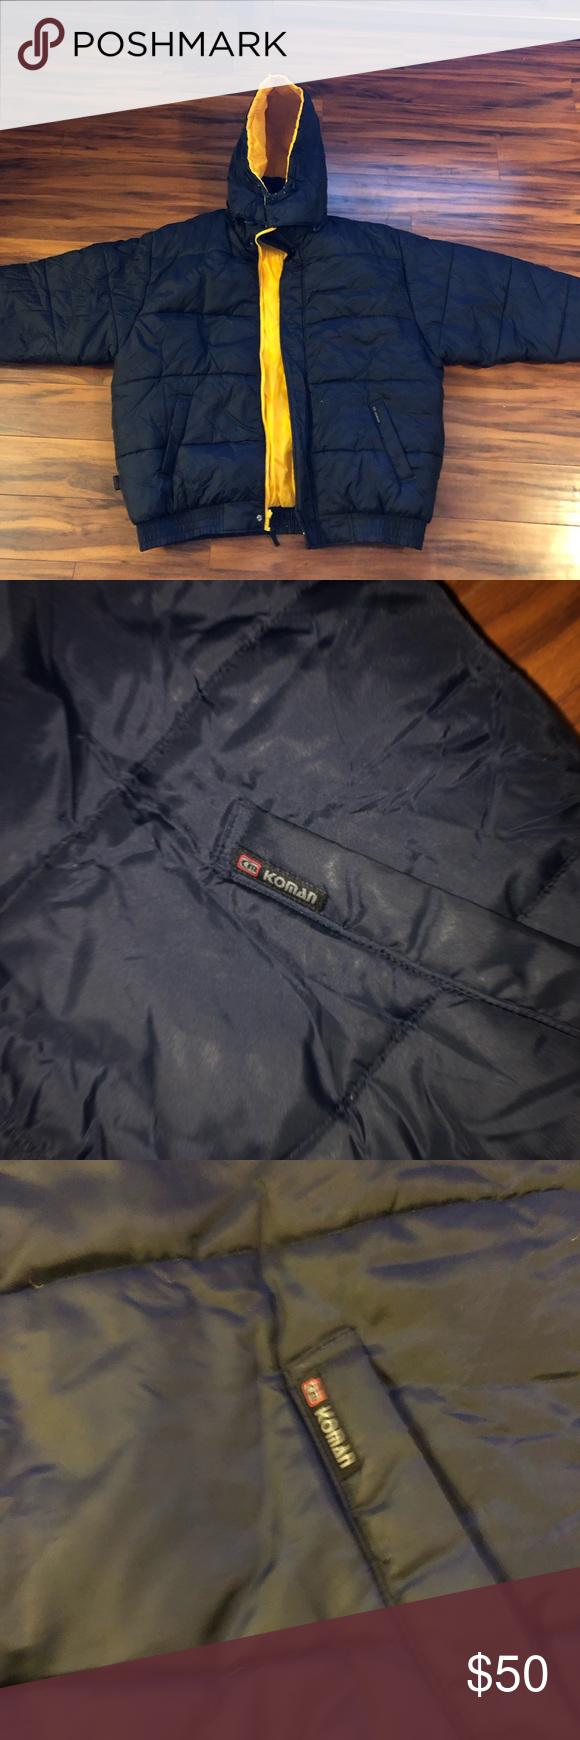 Vintage Koman Sport Puffer Coat 2xl Xxl Reversible Puffer Coat Puffer Vintage [ 1740 x 580 Pixel ]